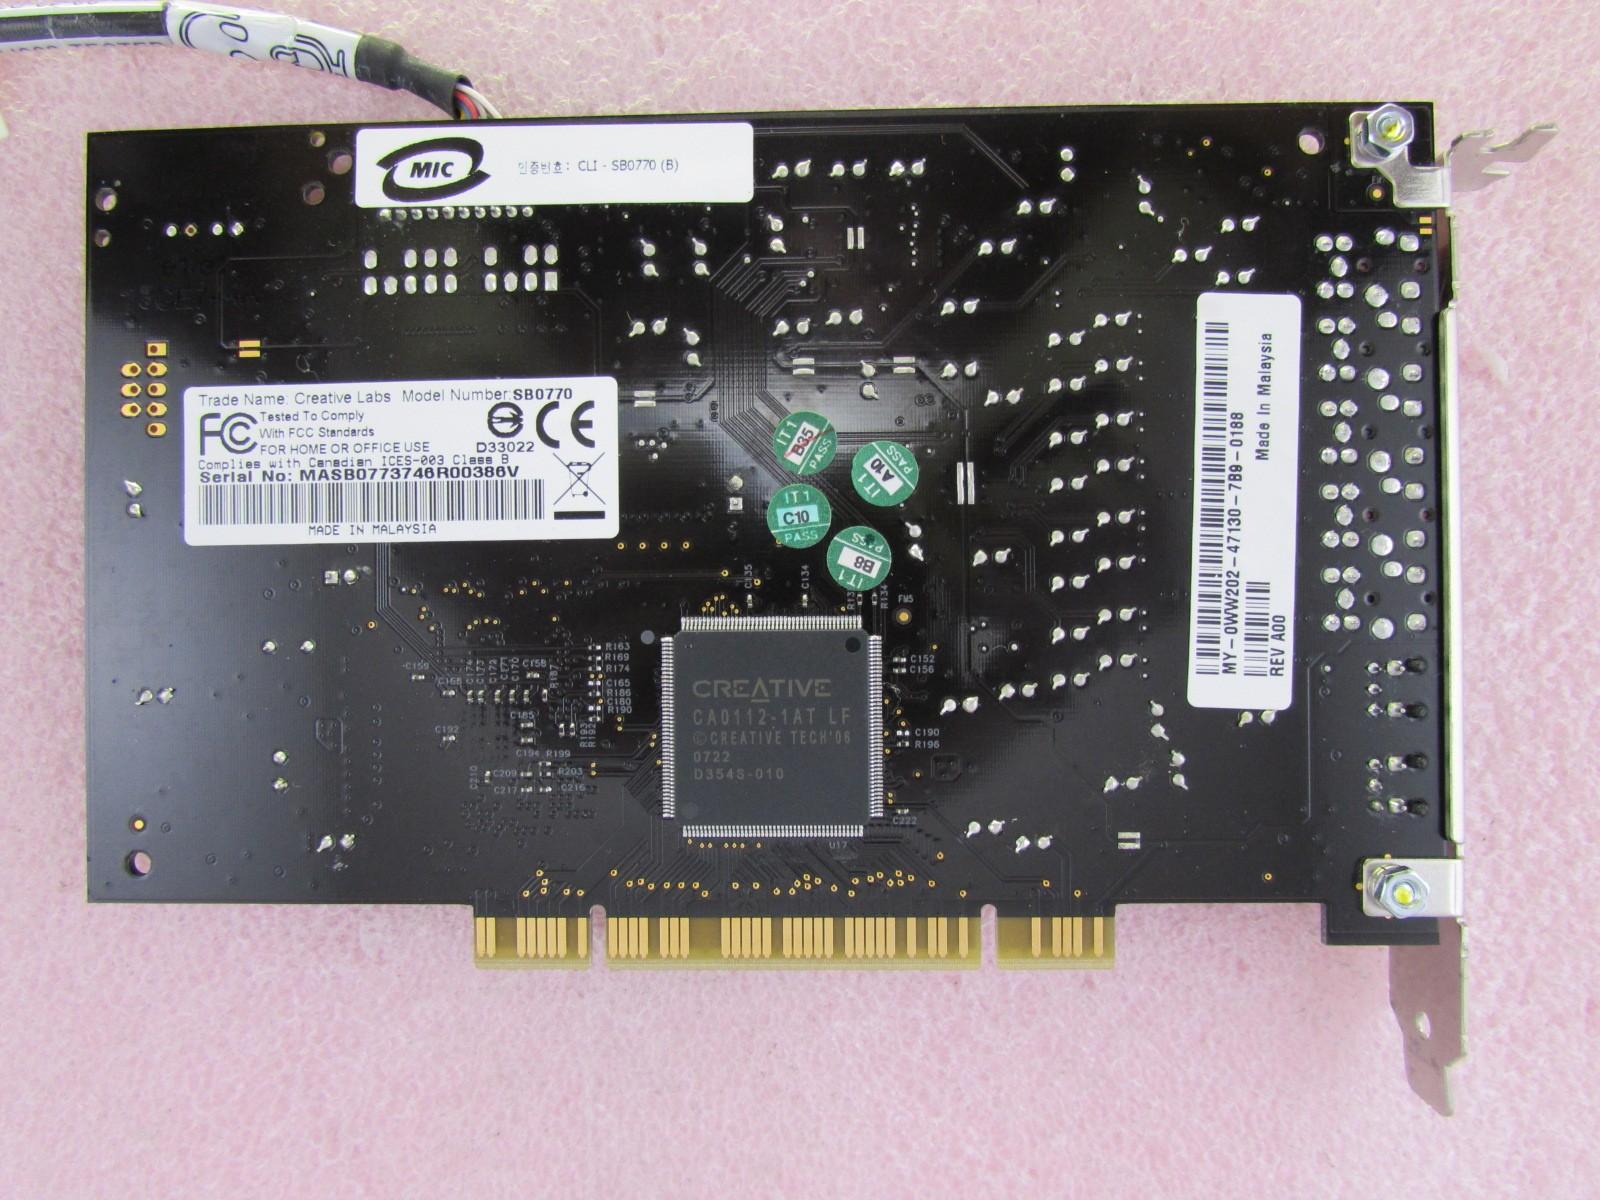 Digicom USB Wave 54 Specifications